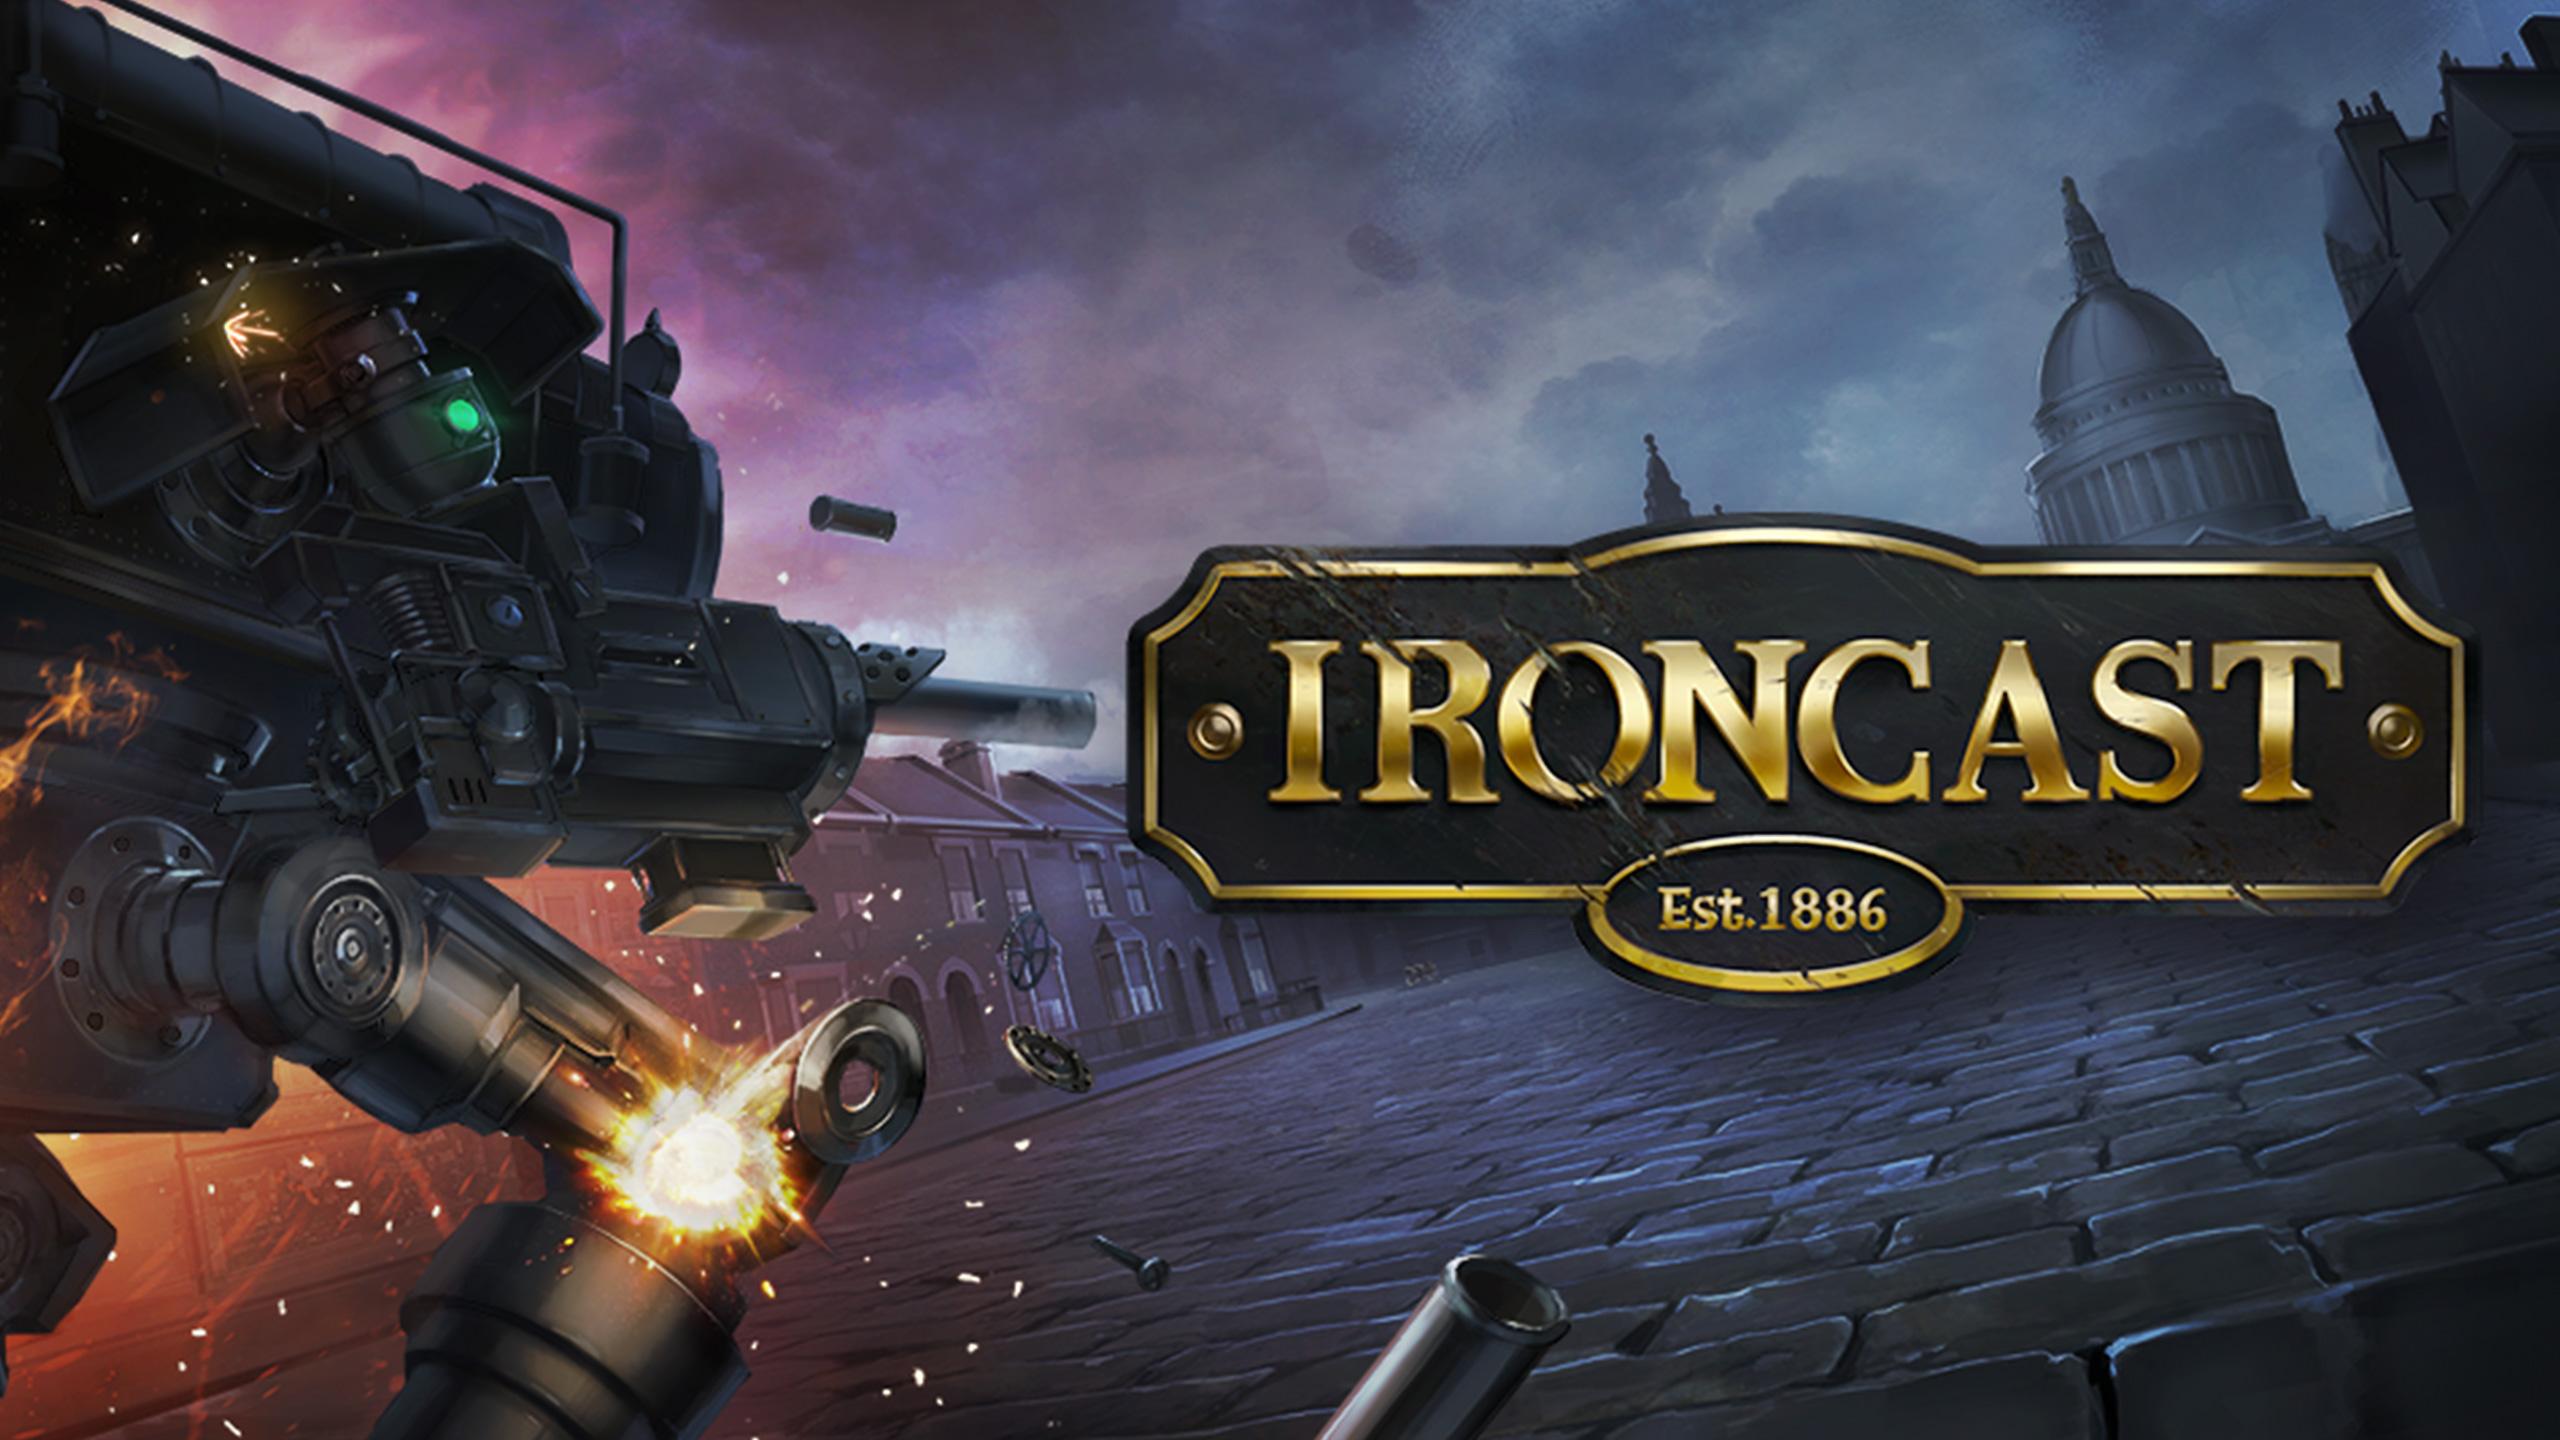 epic-games-birbirinden-eglenceli-iki-oyunu-ucretsiz-yapti (2)